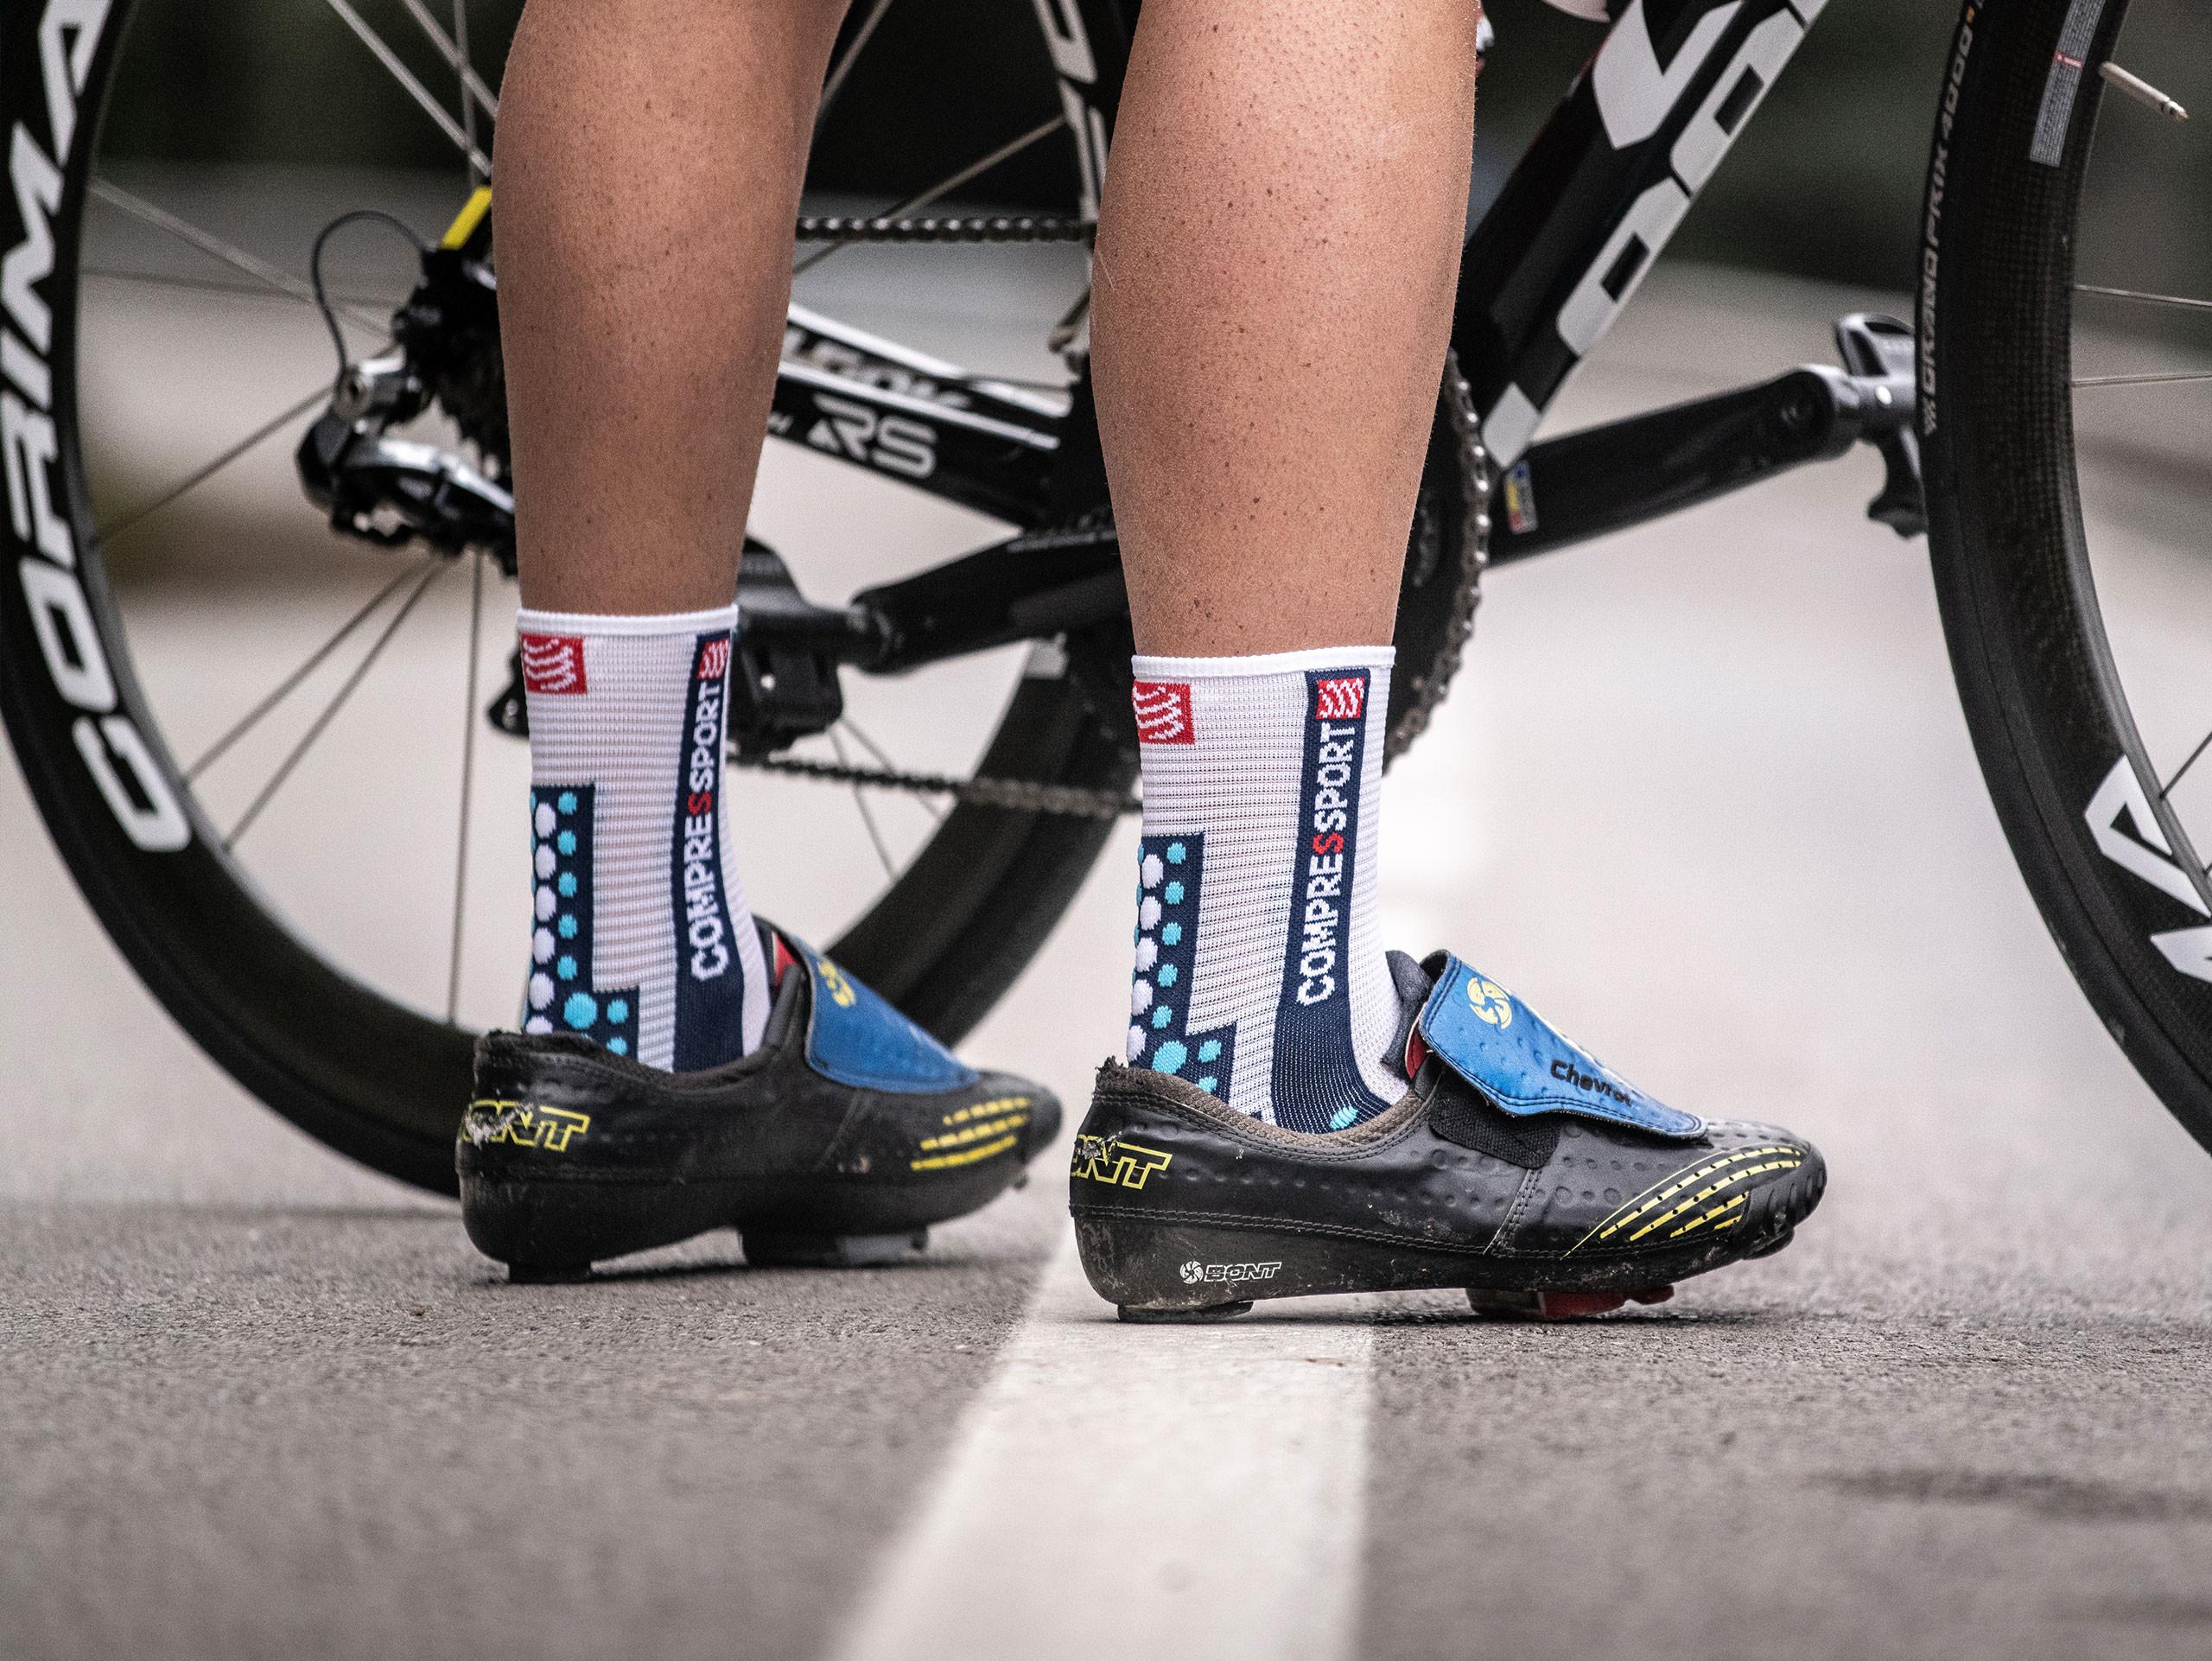 Calcetines deportivos pro v3.0 Bike blanco/azul